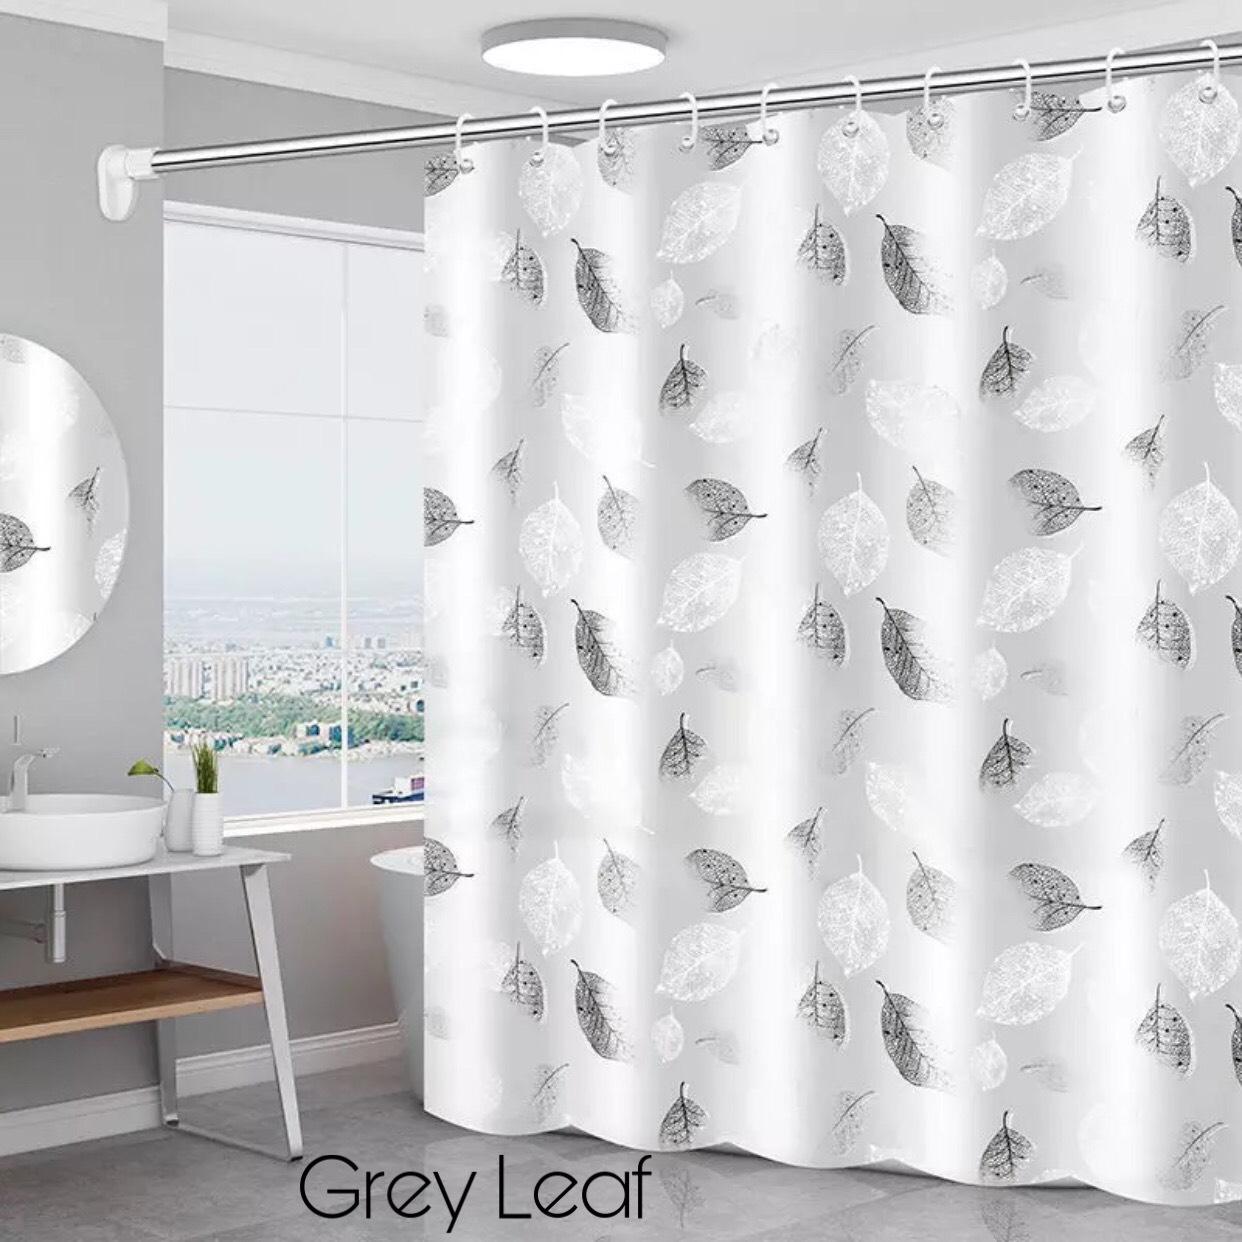 Jaya Acc Tirai Kamar Mandi Shower Curtain High Quality Gorden Kamar Mandi Korden Grade A Peva 100 Lazada Indonesia Lazada tirai kamar mandi